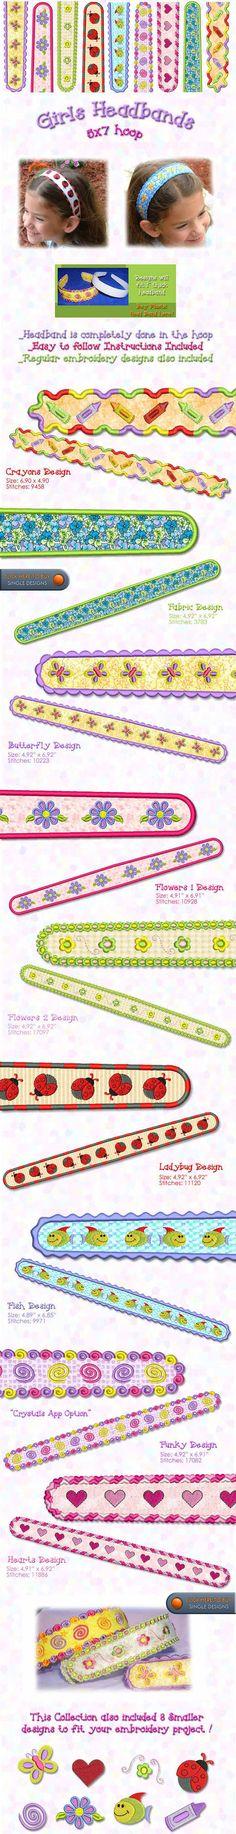 Cute headbands - monogramming in the hoop design